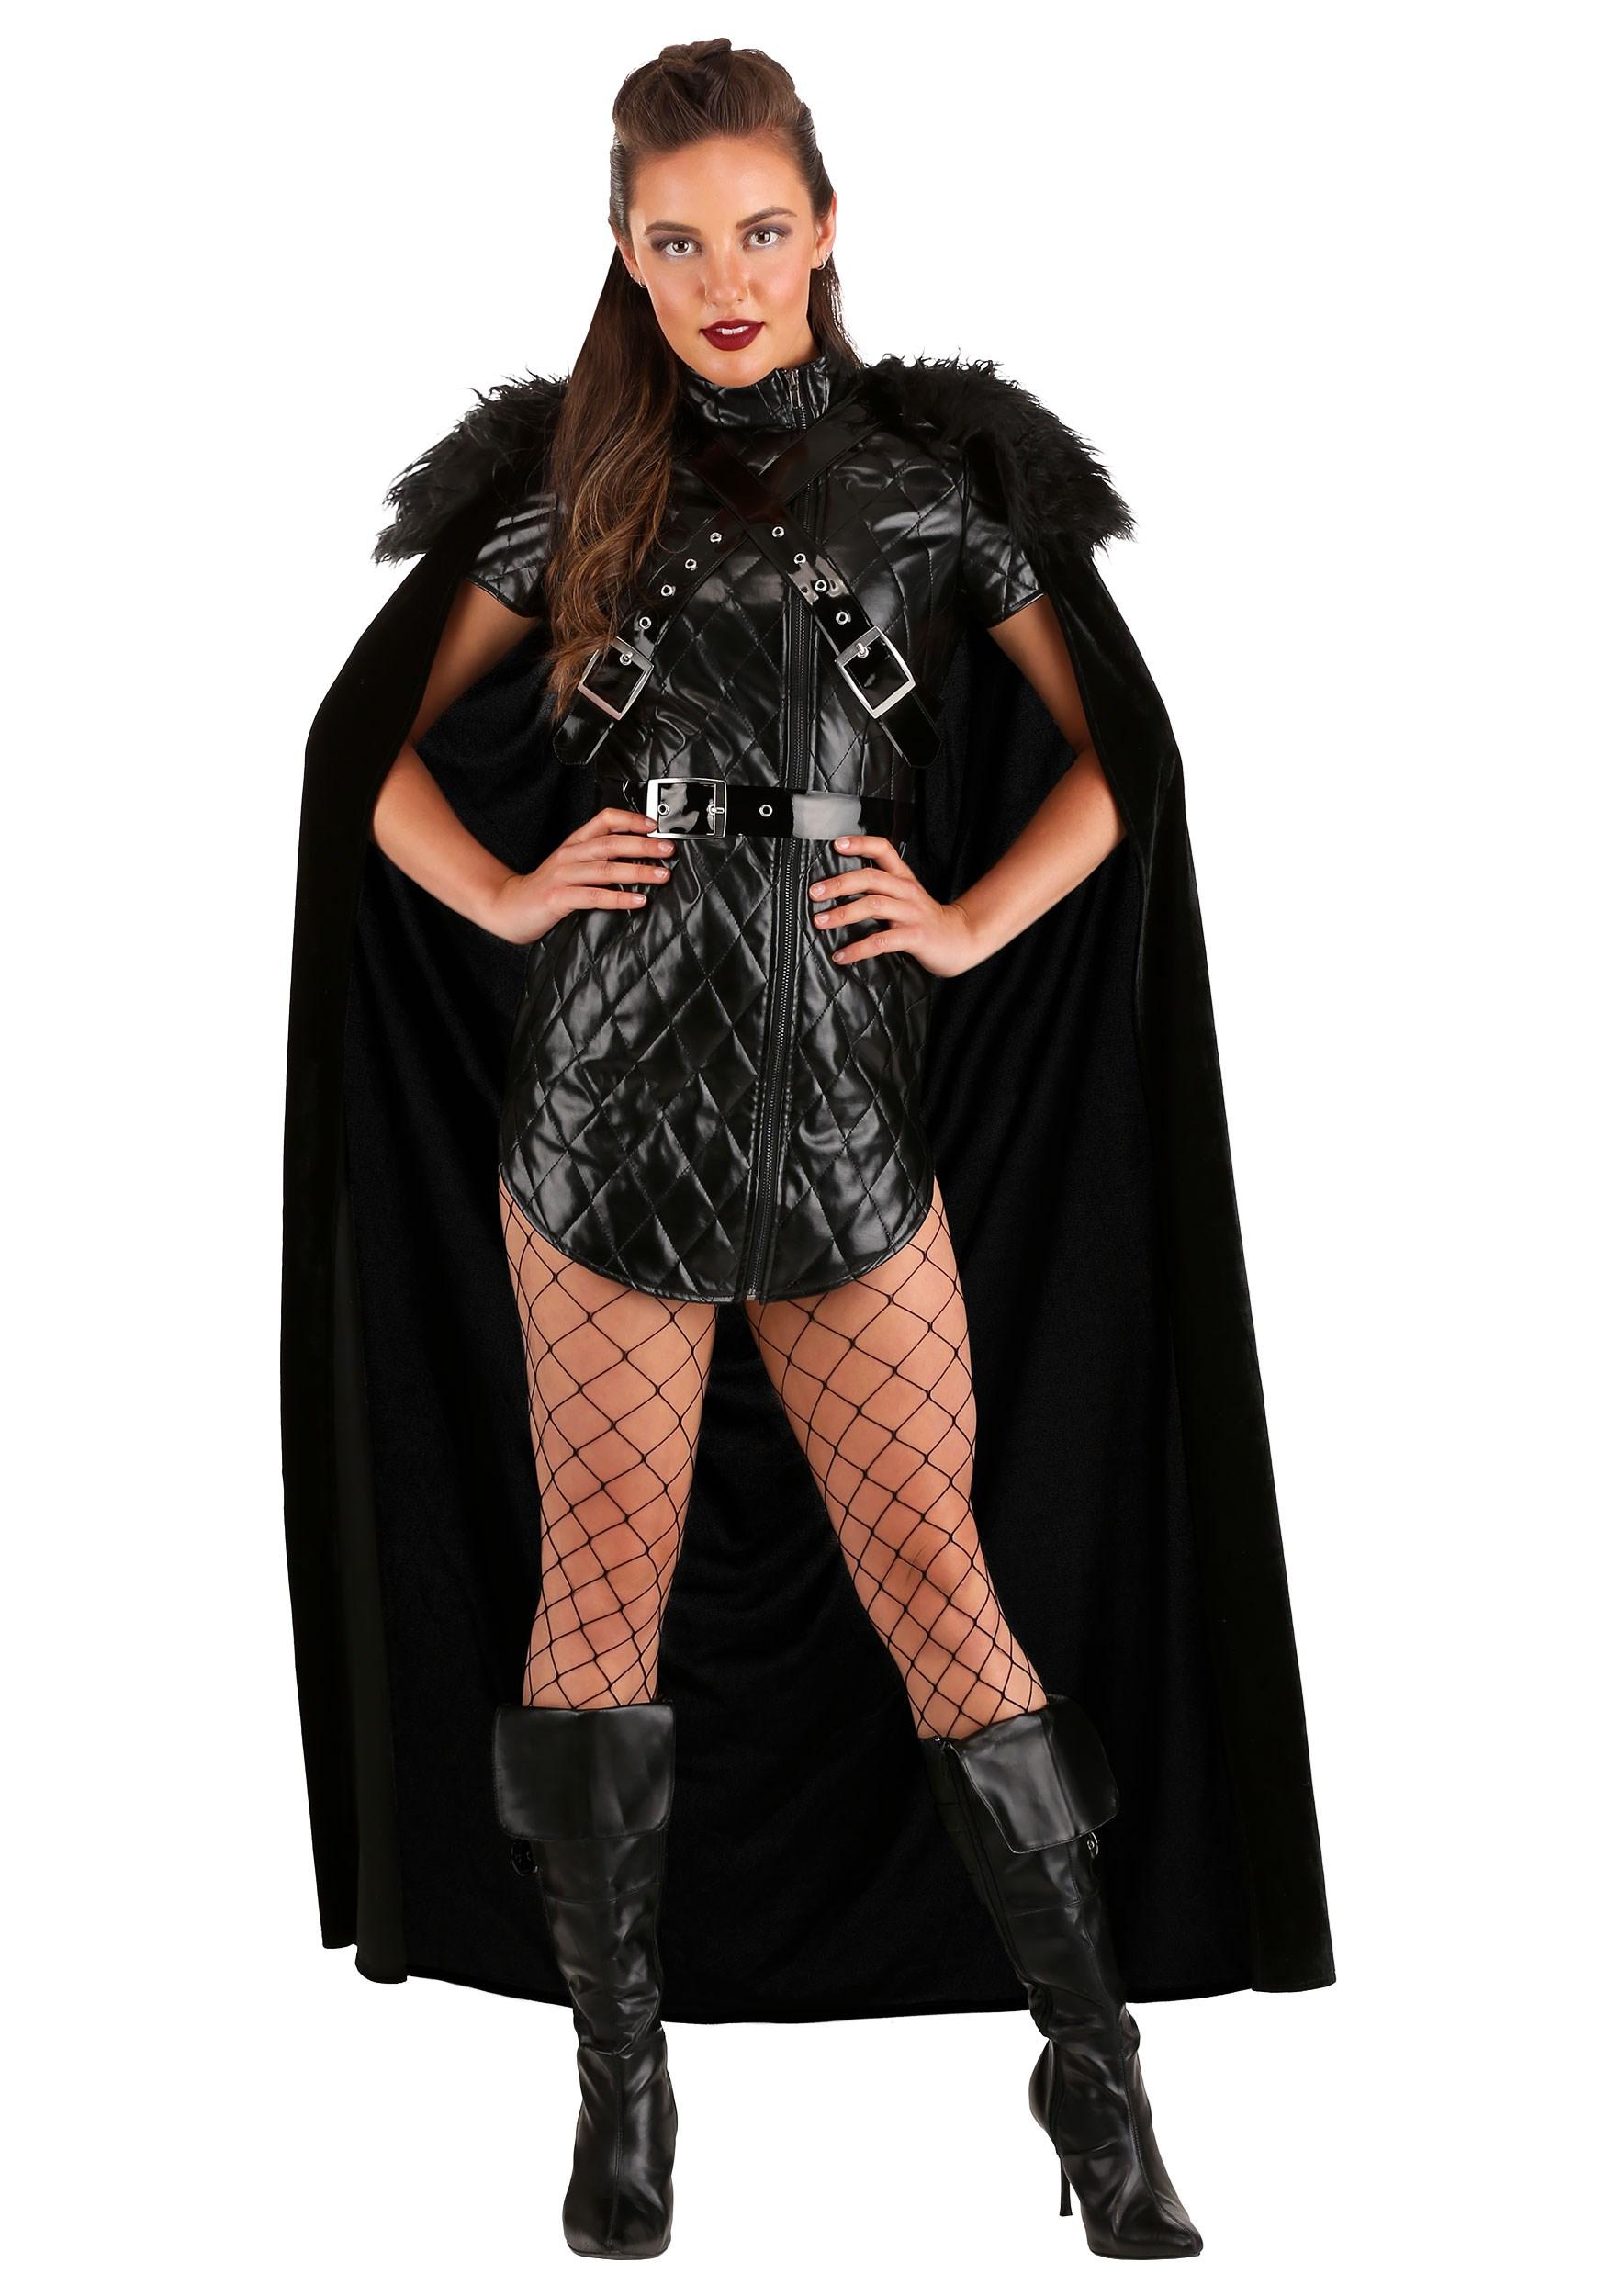 Snow King Costume for Women